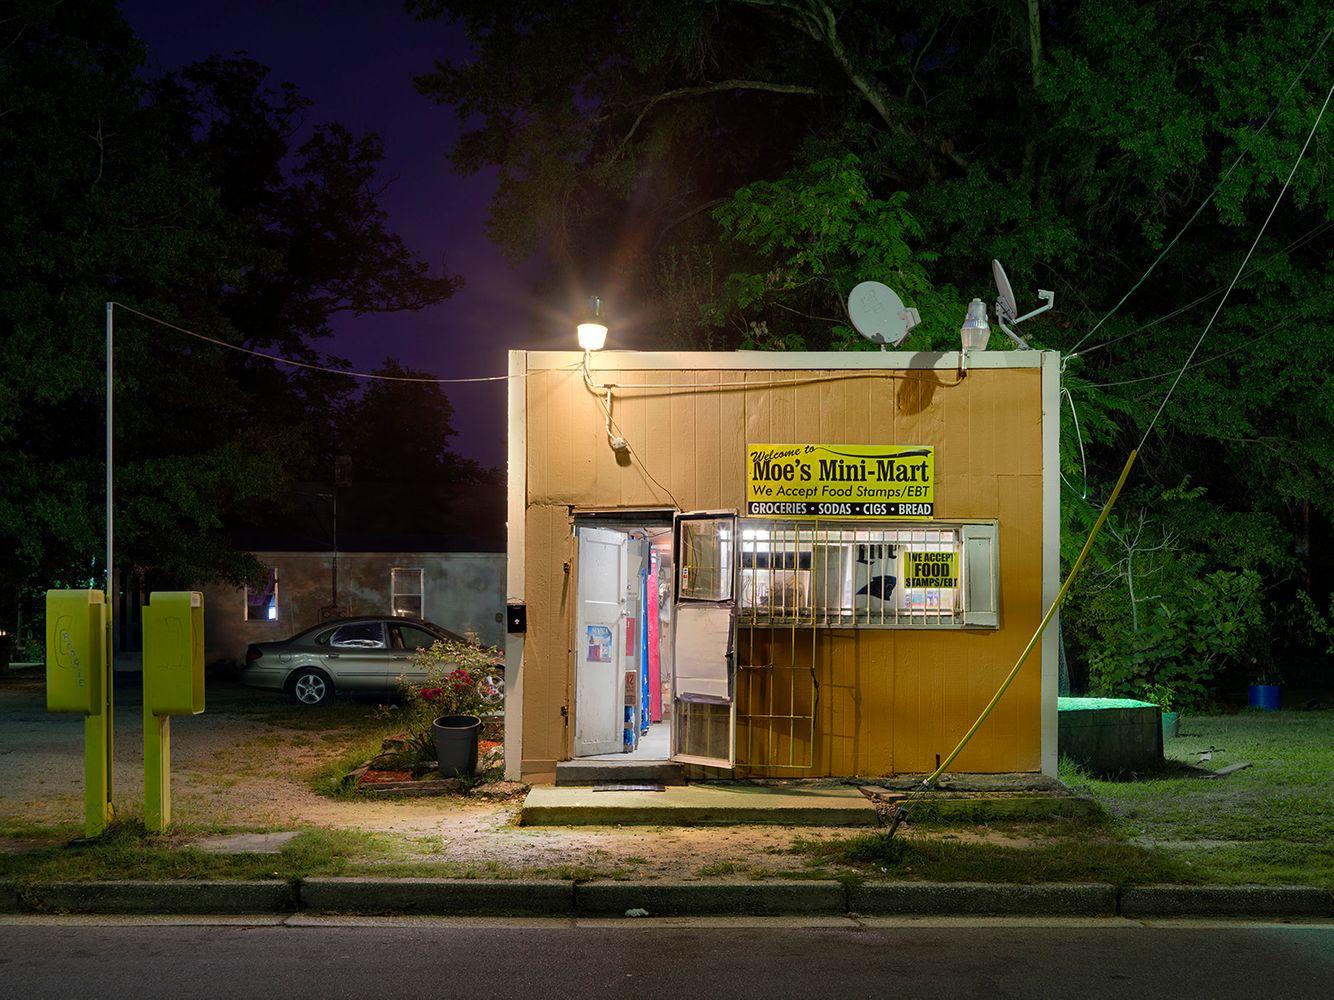 Moe's Mini-Mart, Wilson, NC 2018